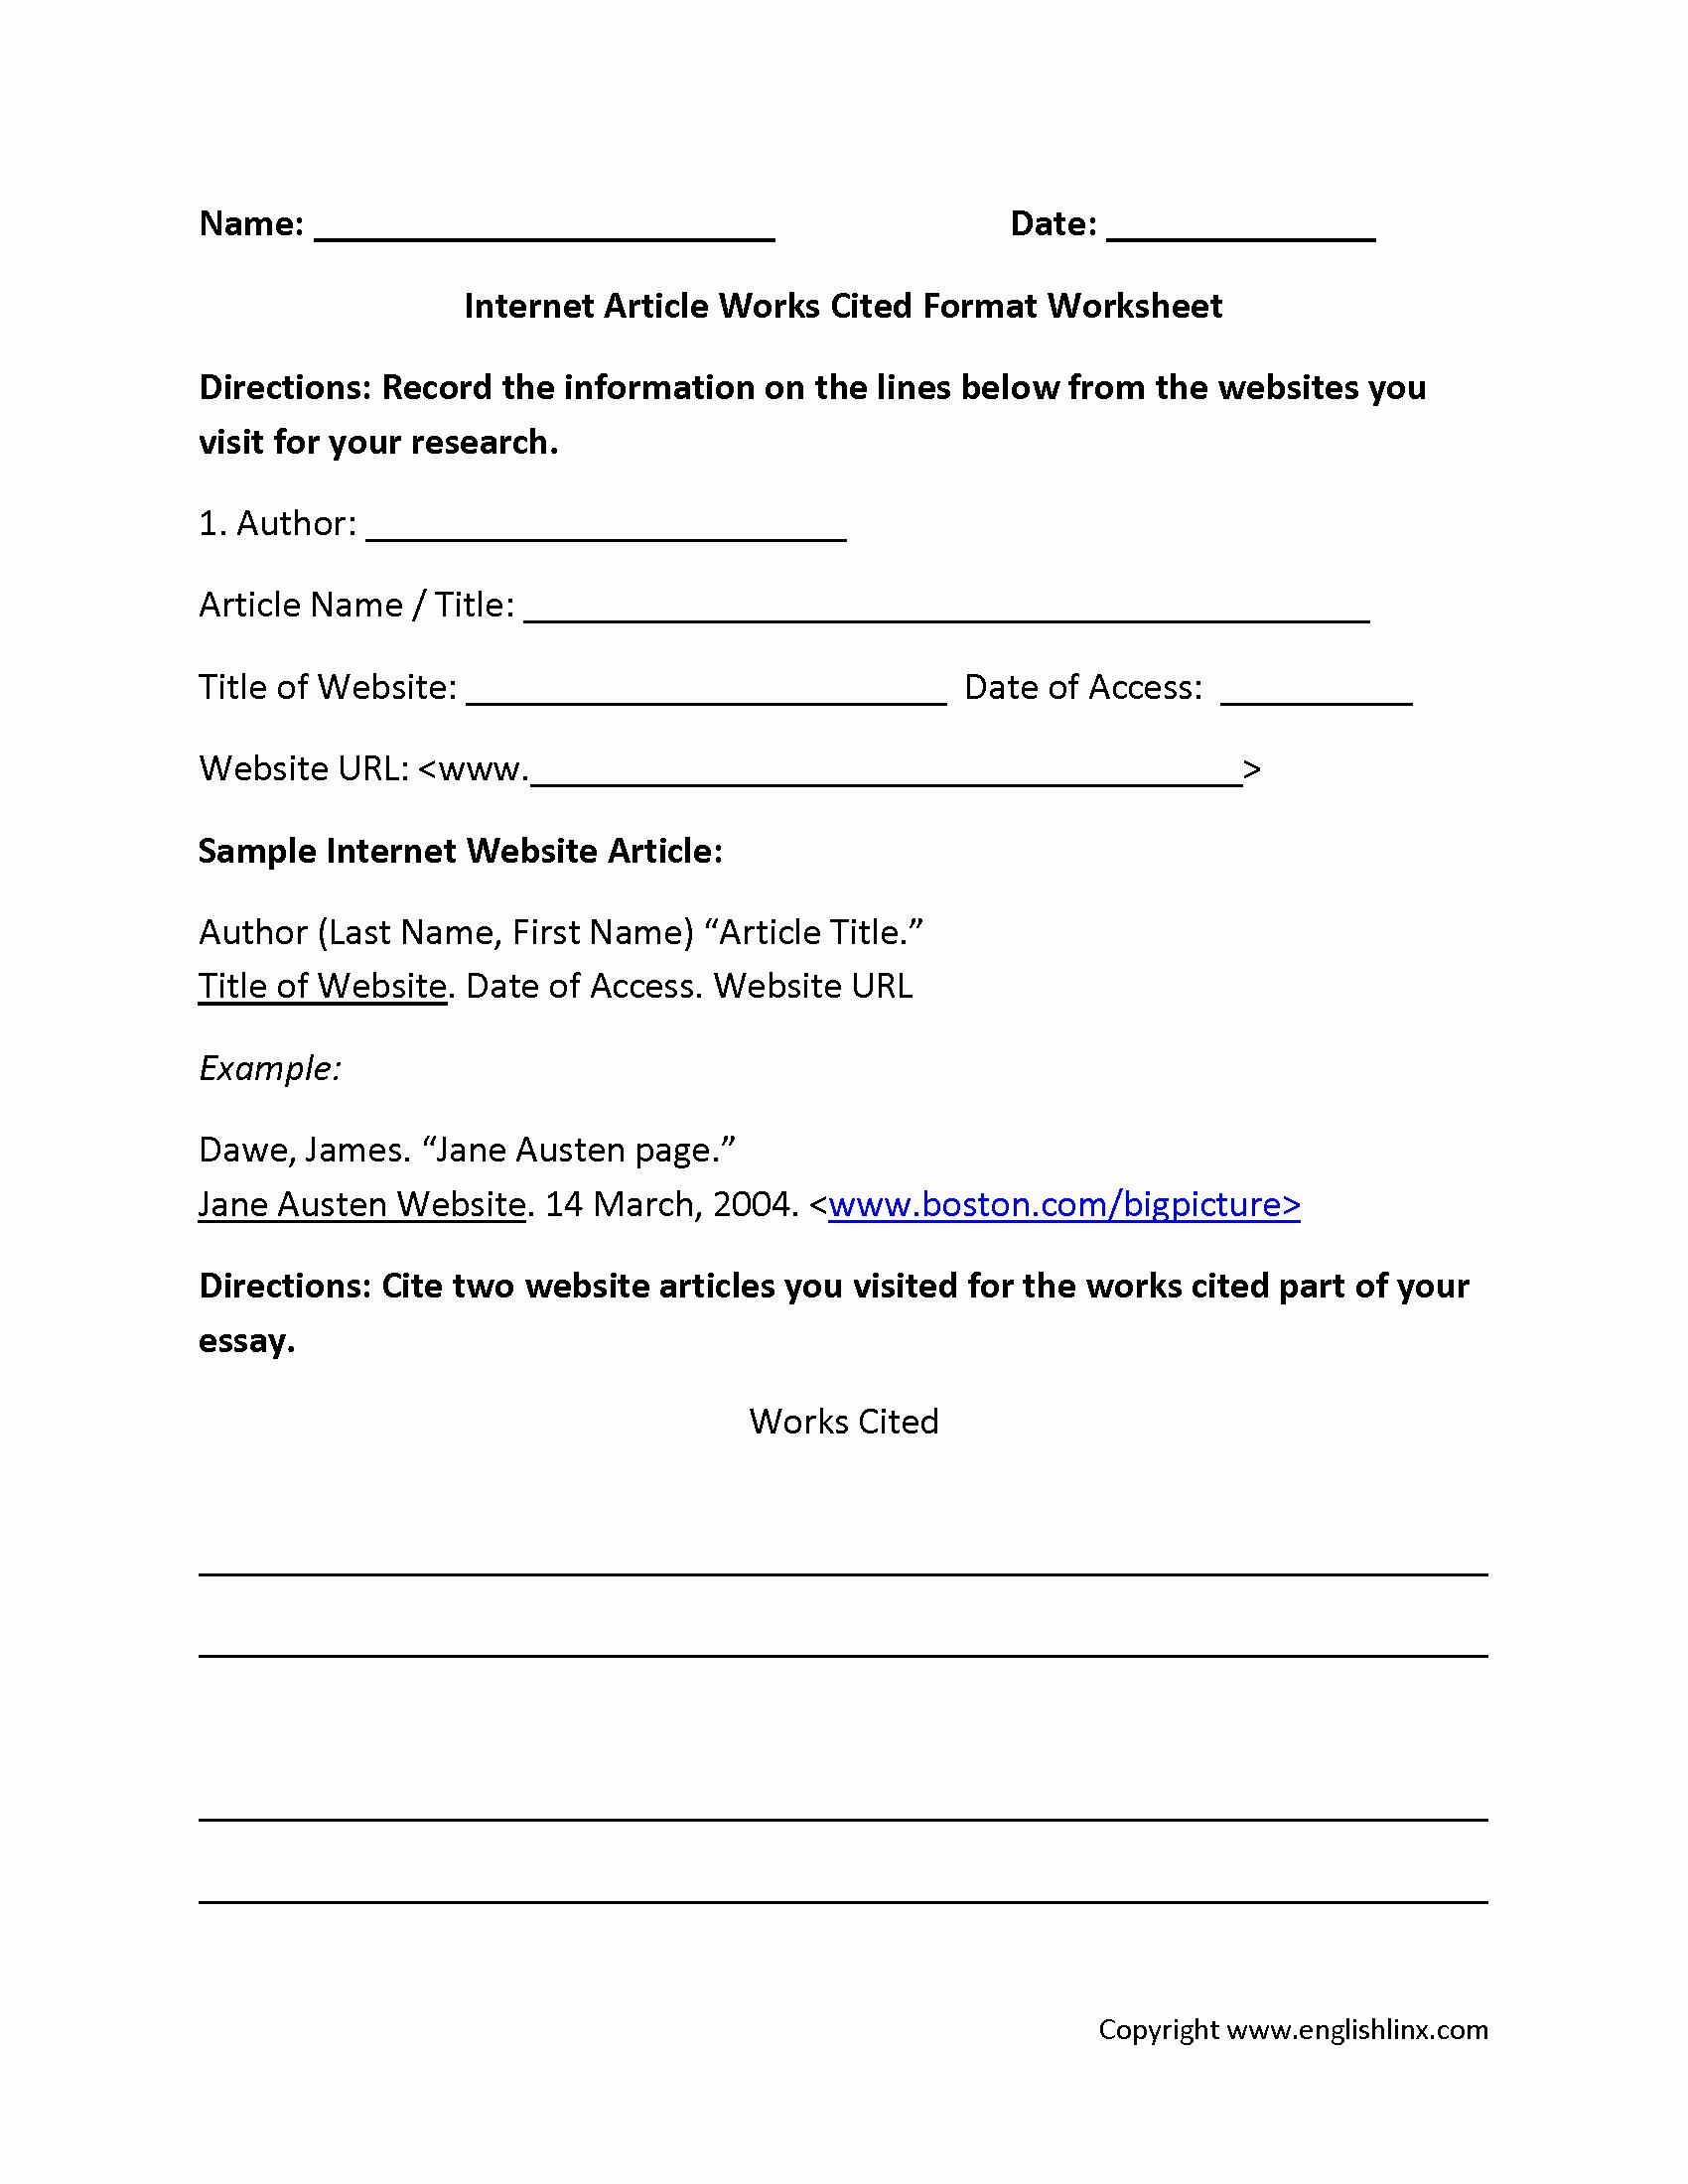 Bibliography Practice Worksheets Inspirational Mla Citation Practice Worksheet